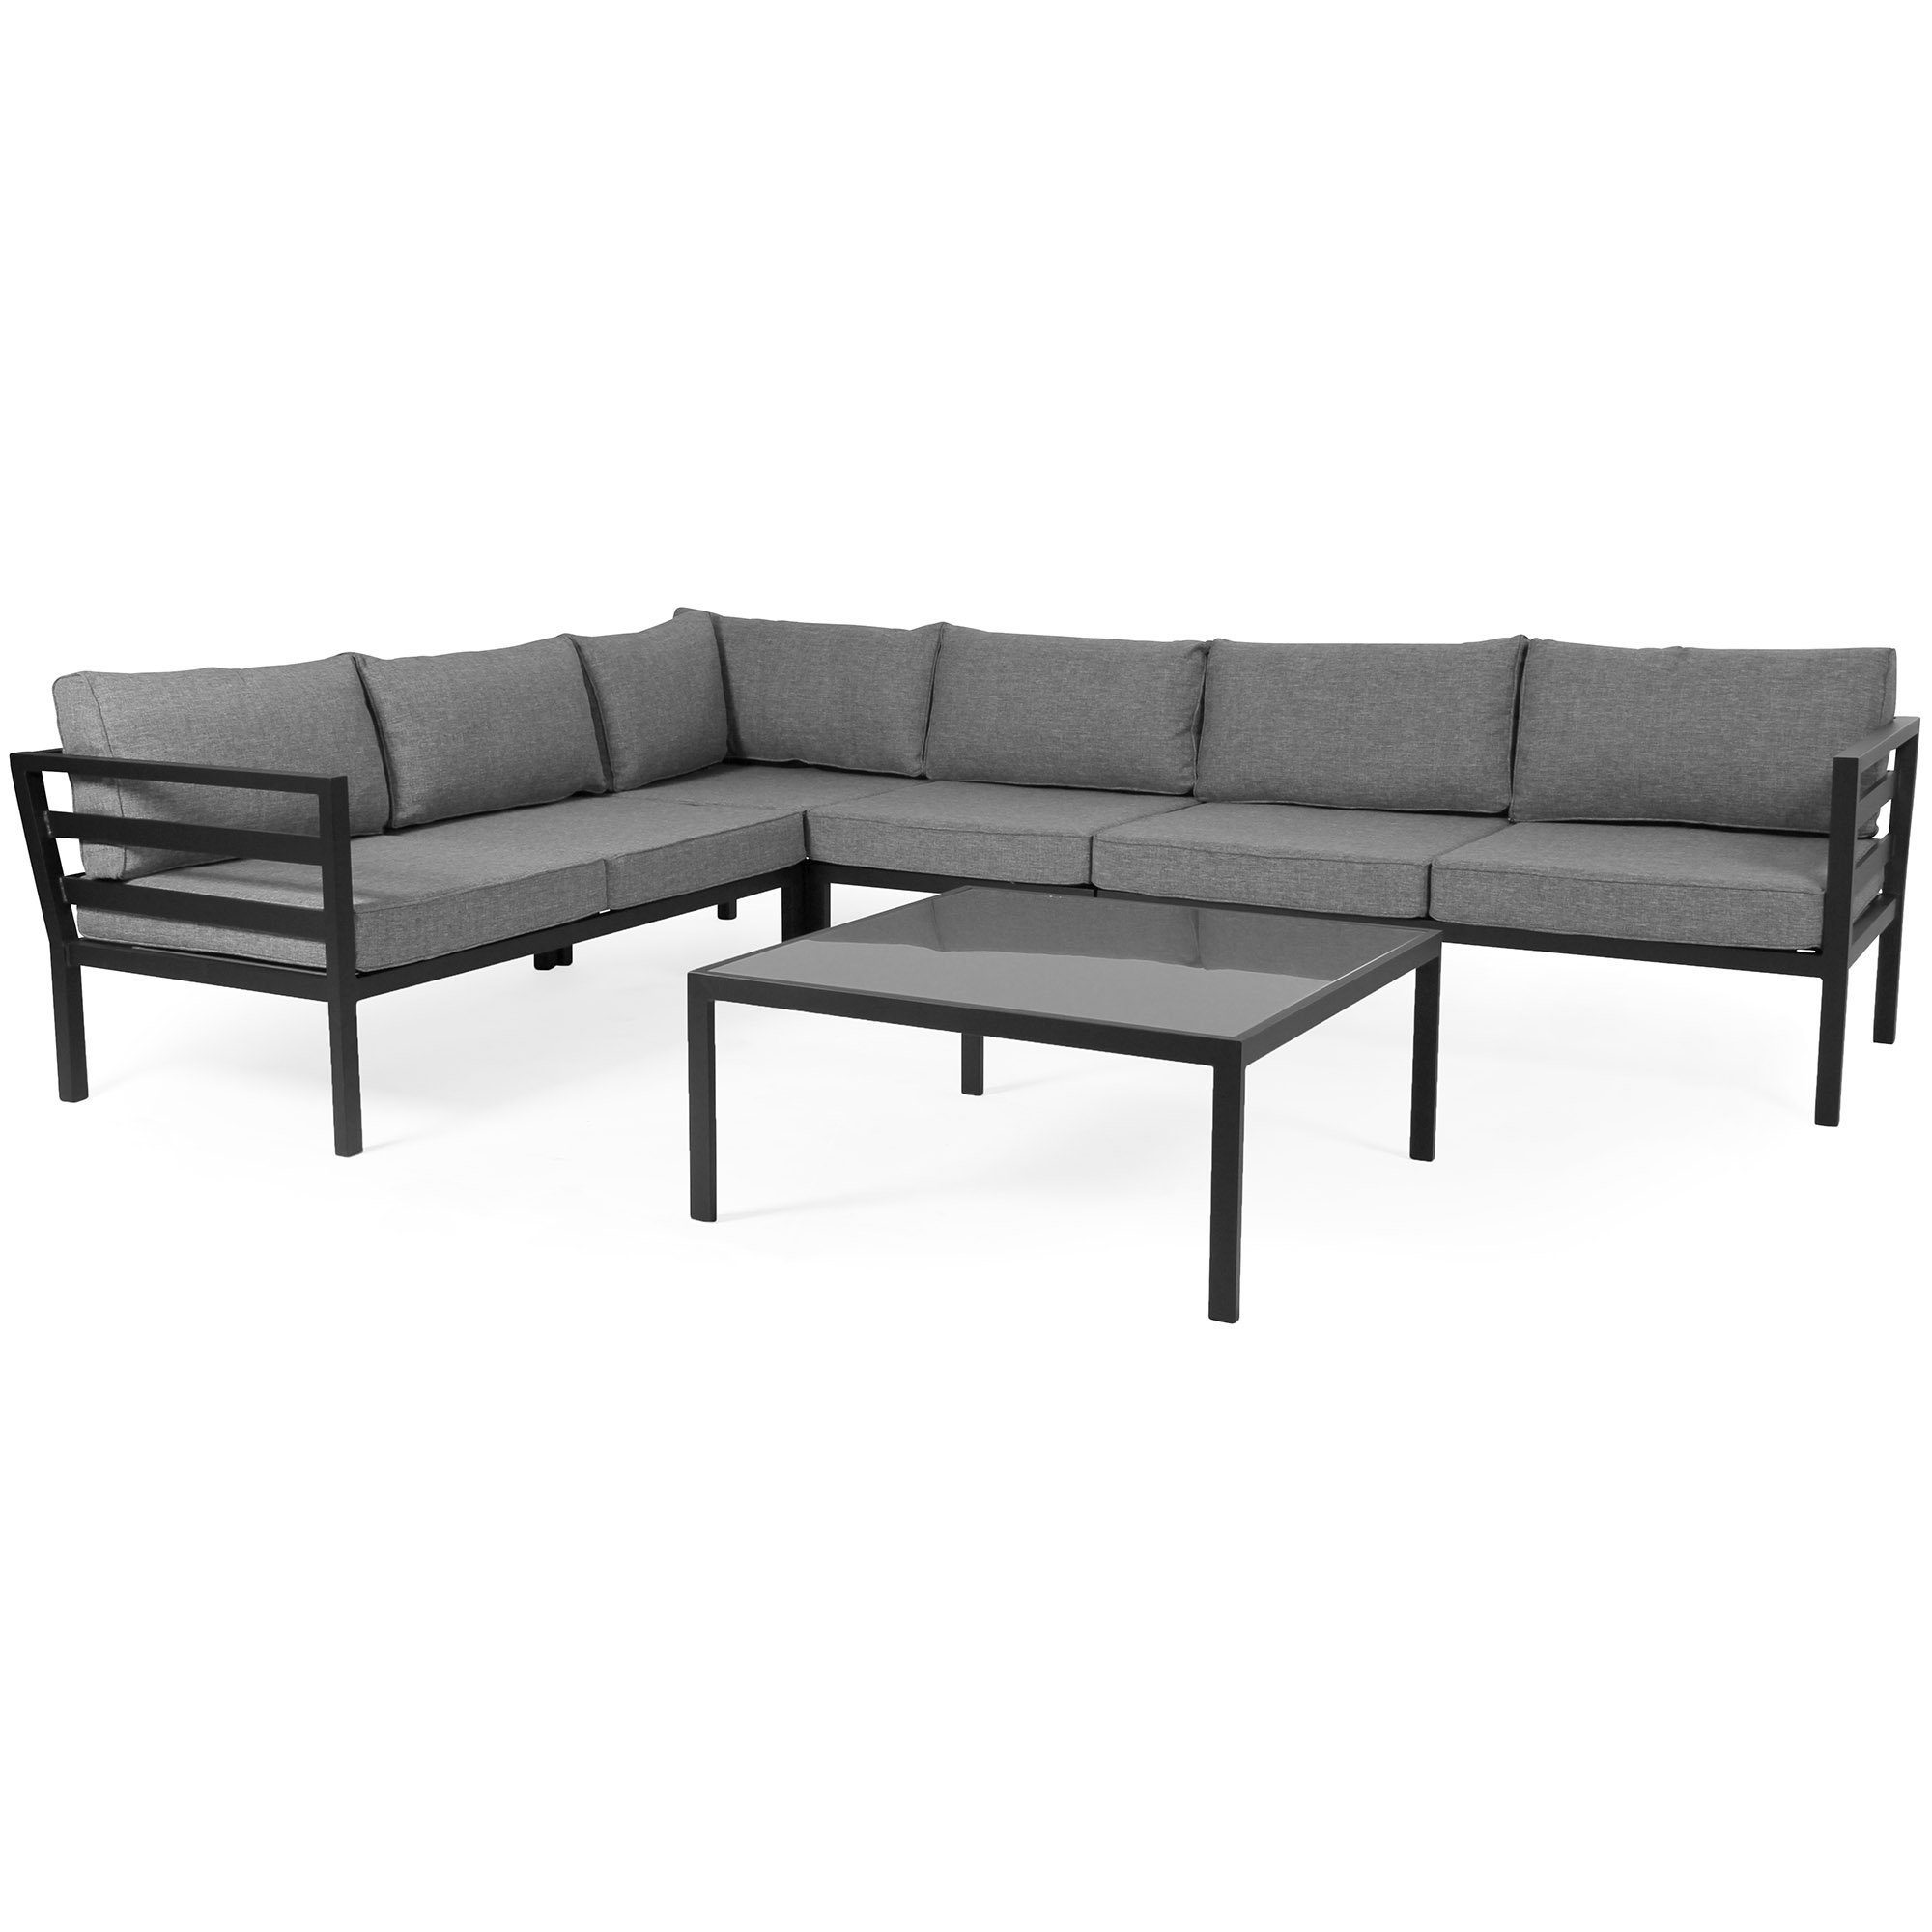 "Стол садовый ""Leone"" 90х90 см, цвет черный Brafab"